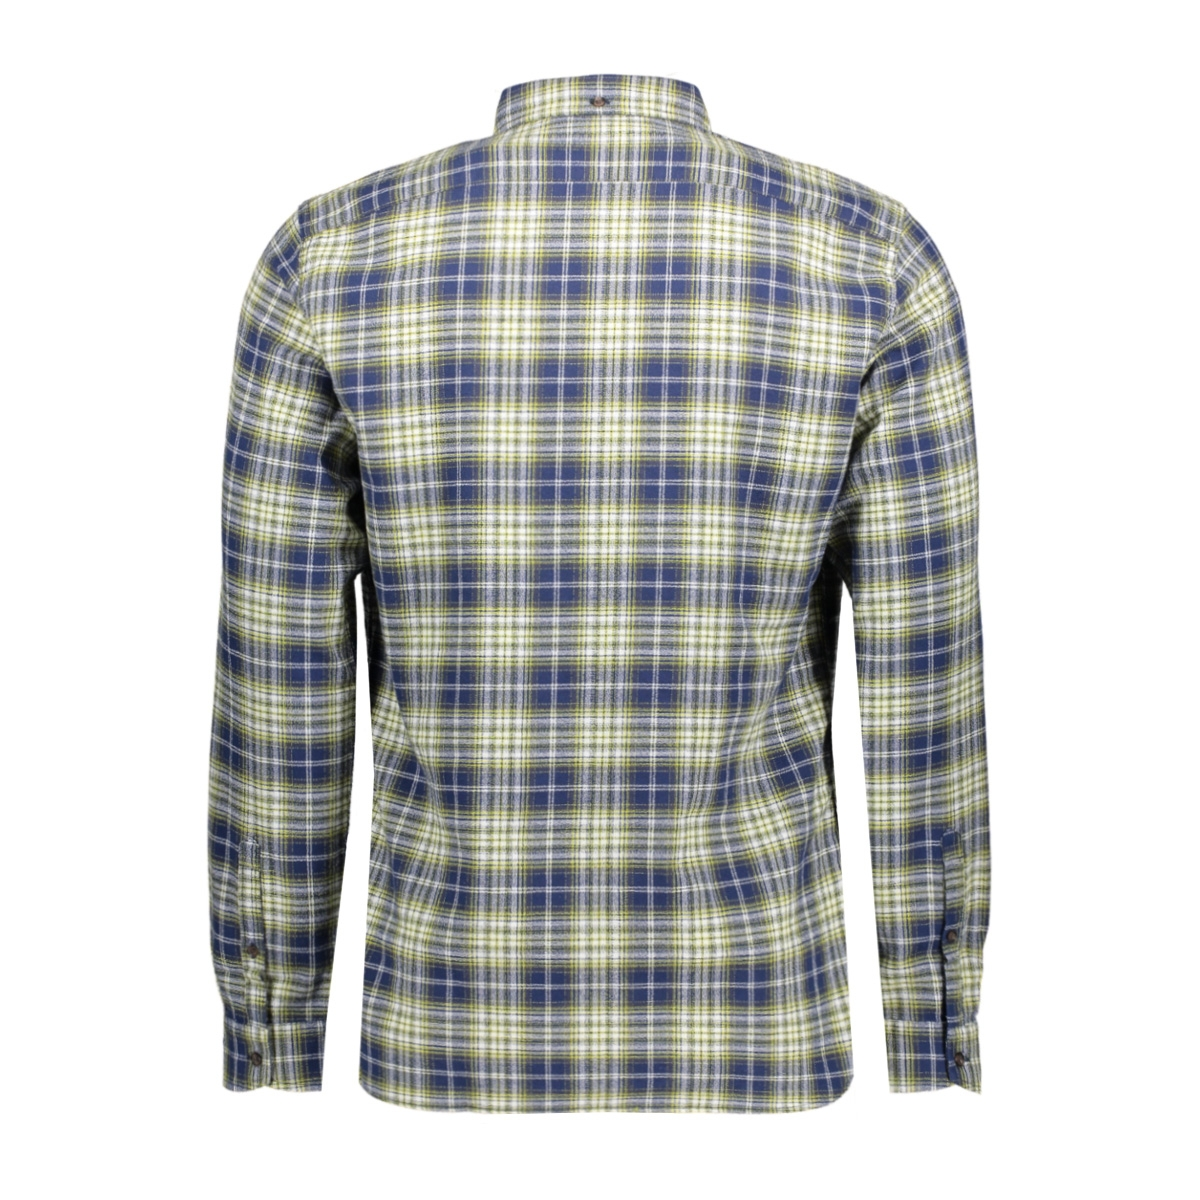 097ee2f013 esprit overhemd e405